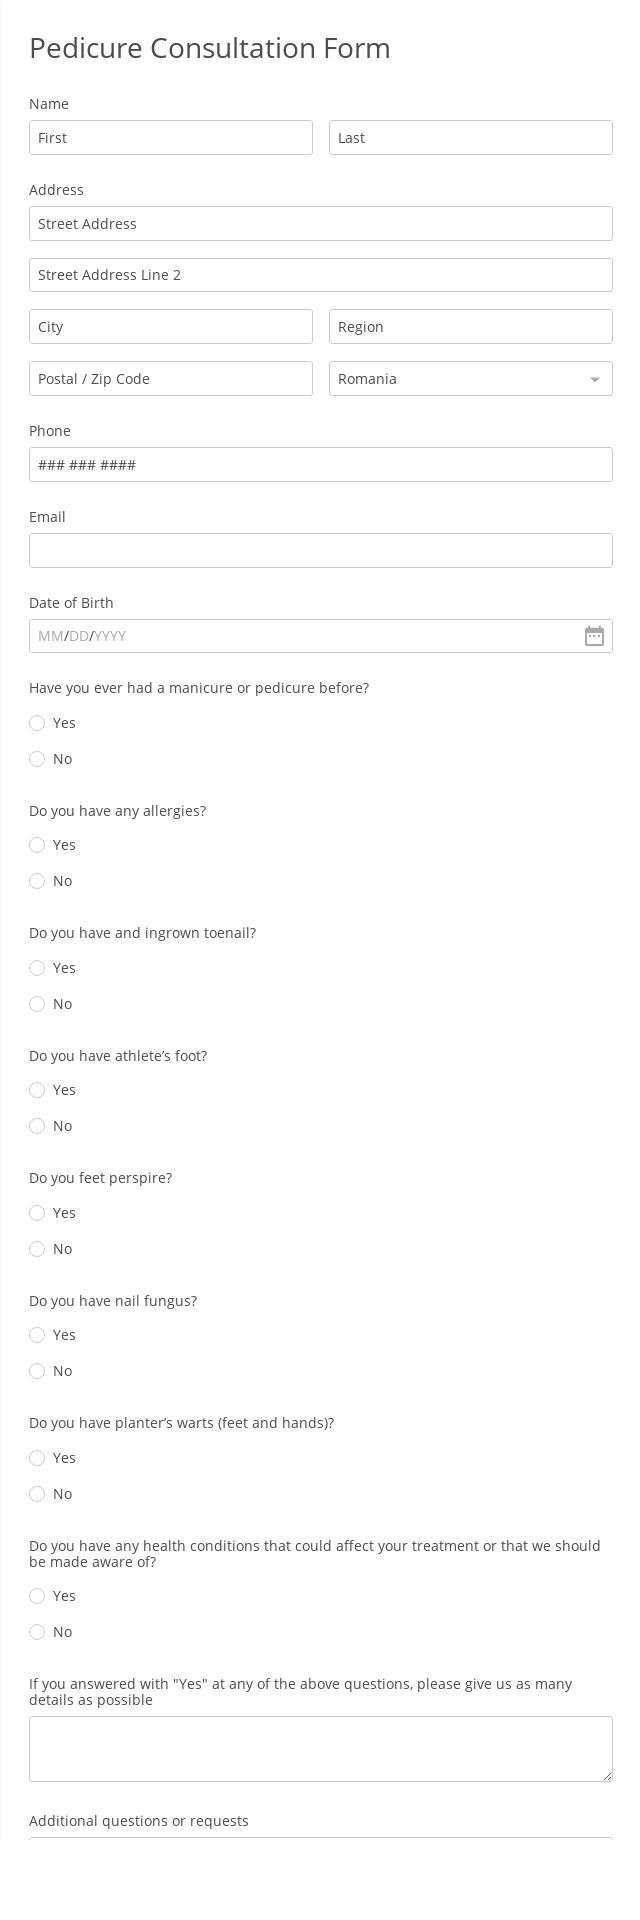 Pedicure Consultation Form